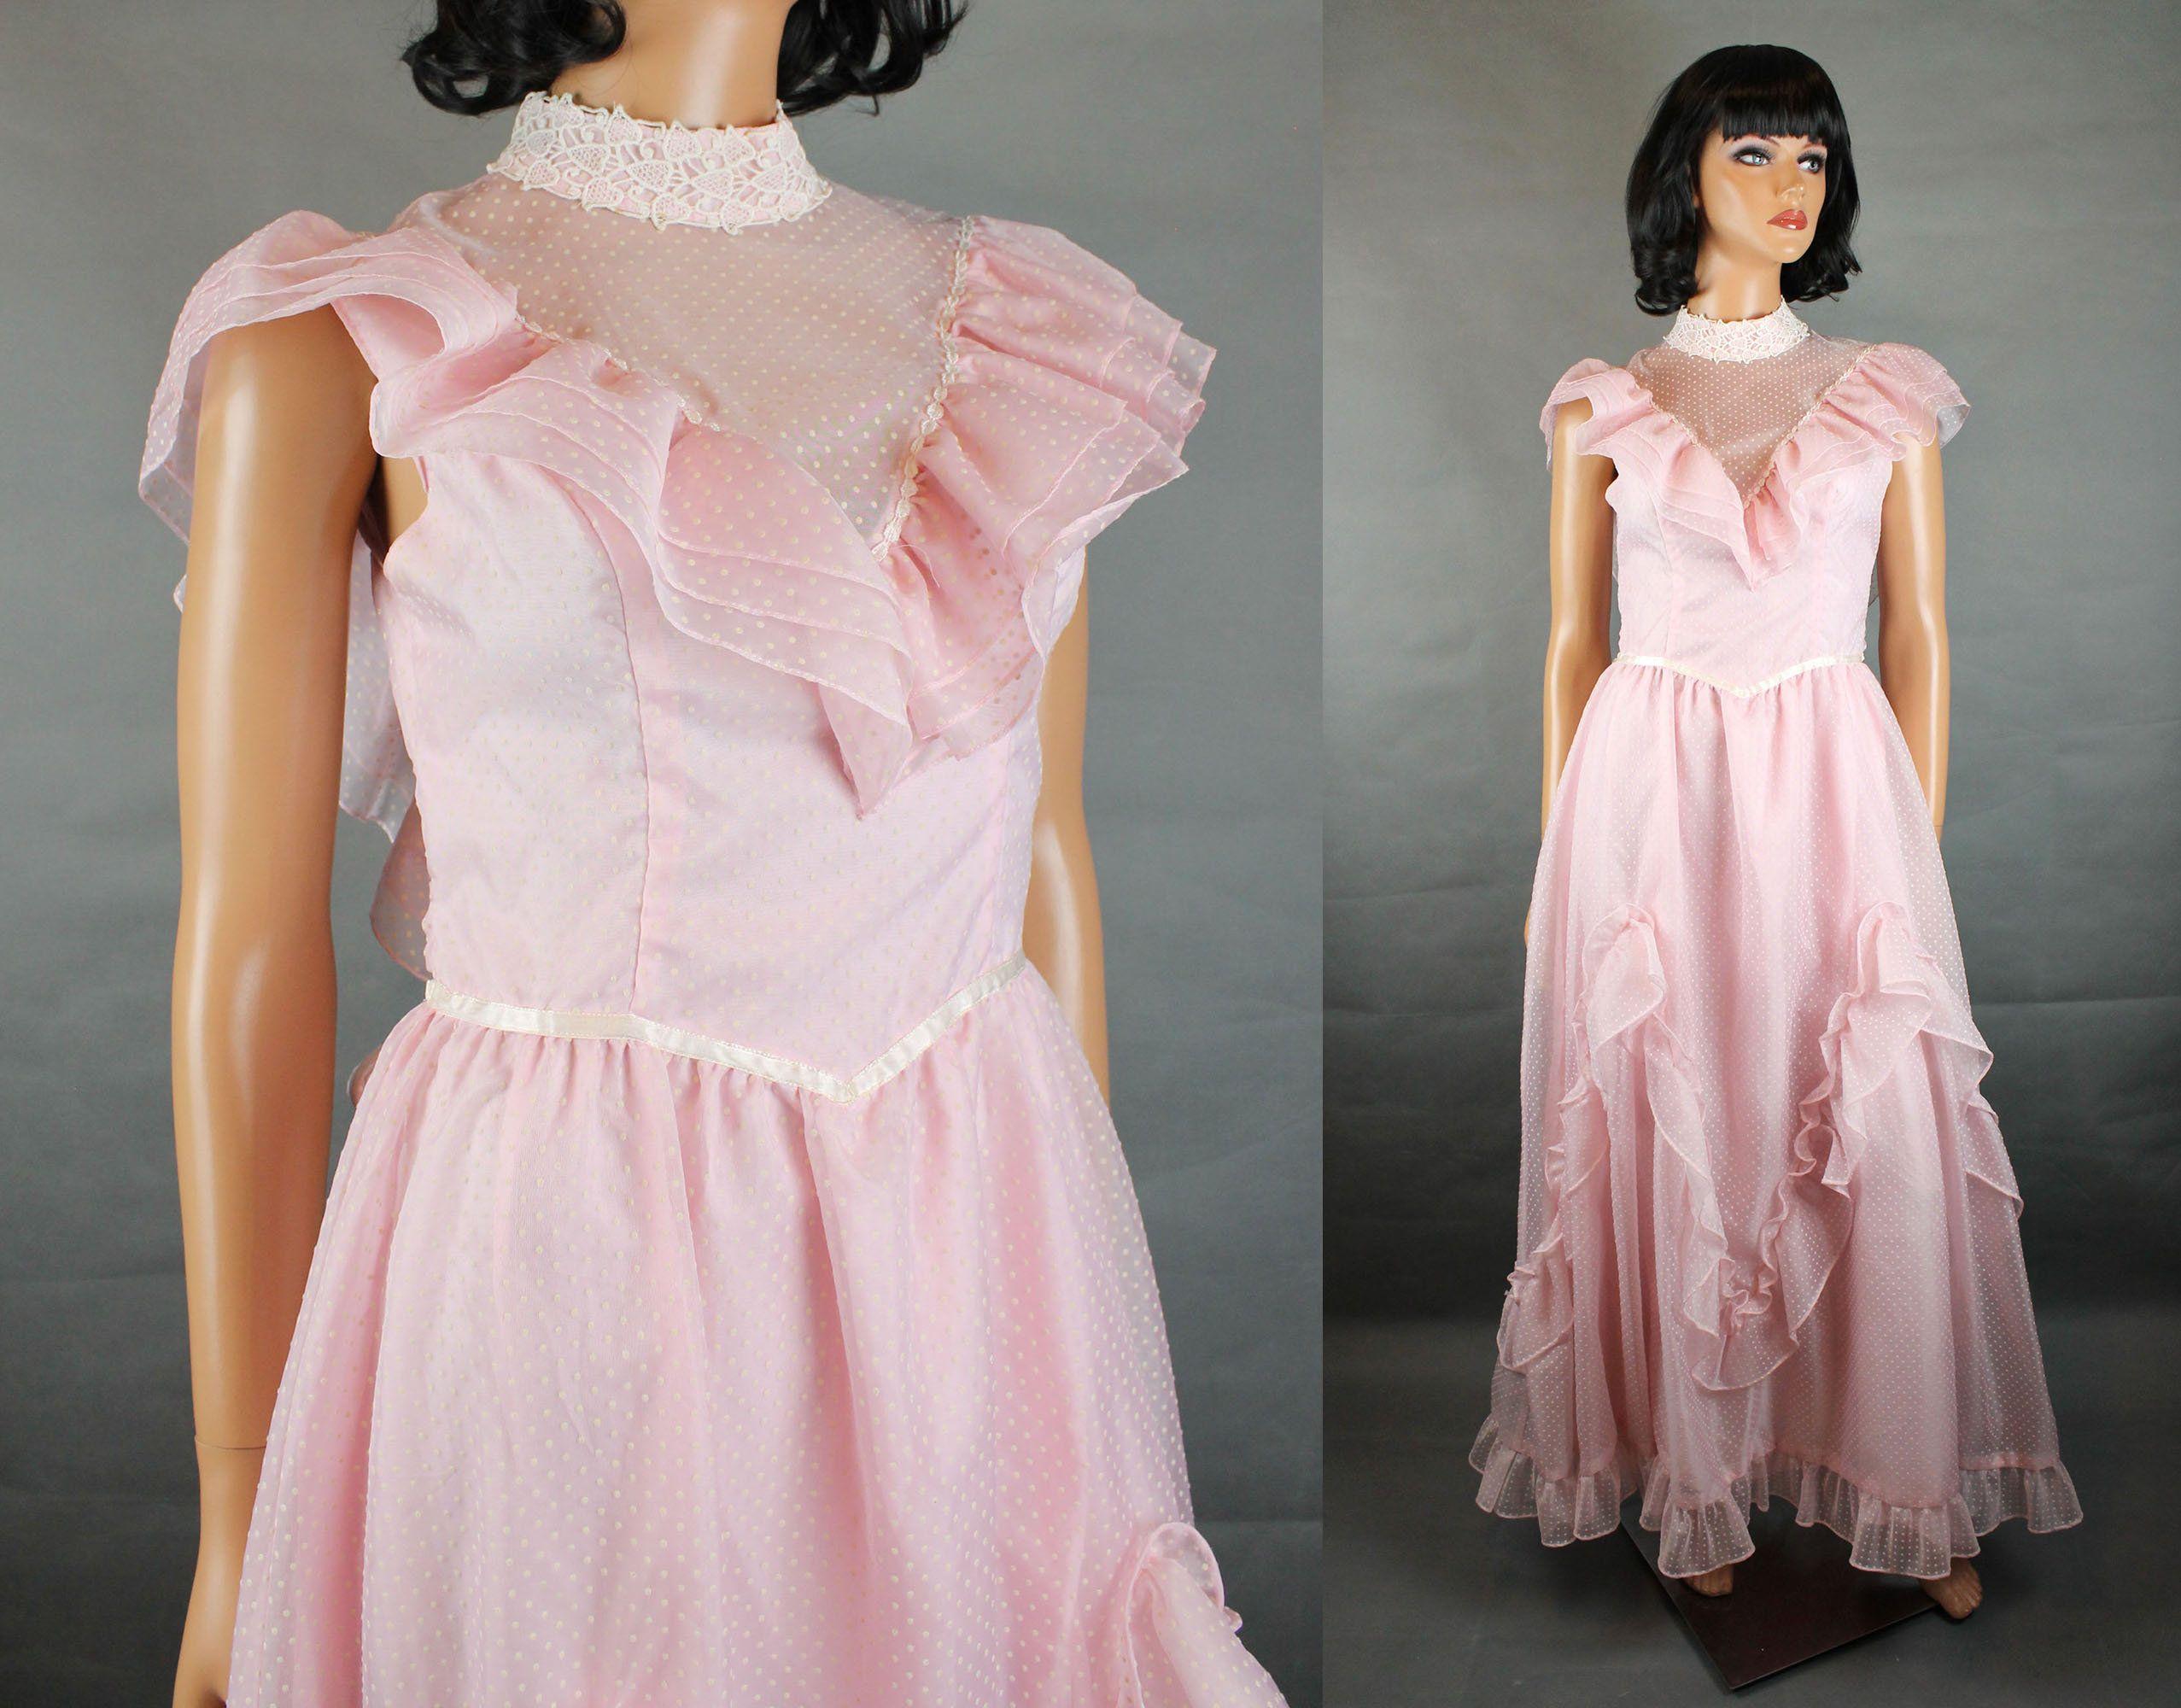 Hippie Wedding Gown Xs Vintage 70s Pink White Swiss Dot Chiffon Ruffled Dress Free Us Shipping By Chiffon Ruffle Dress Wedding Dresses For Girls Hippie Wedding [ 2000 x 2554 Pixel ]